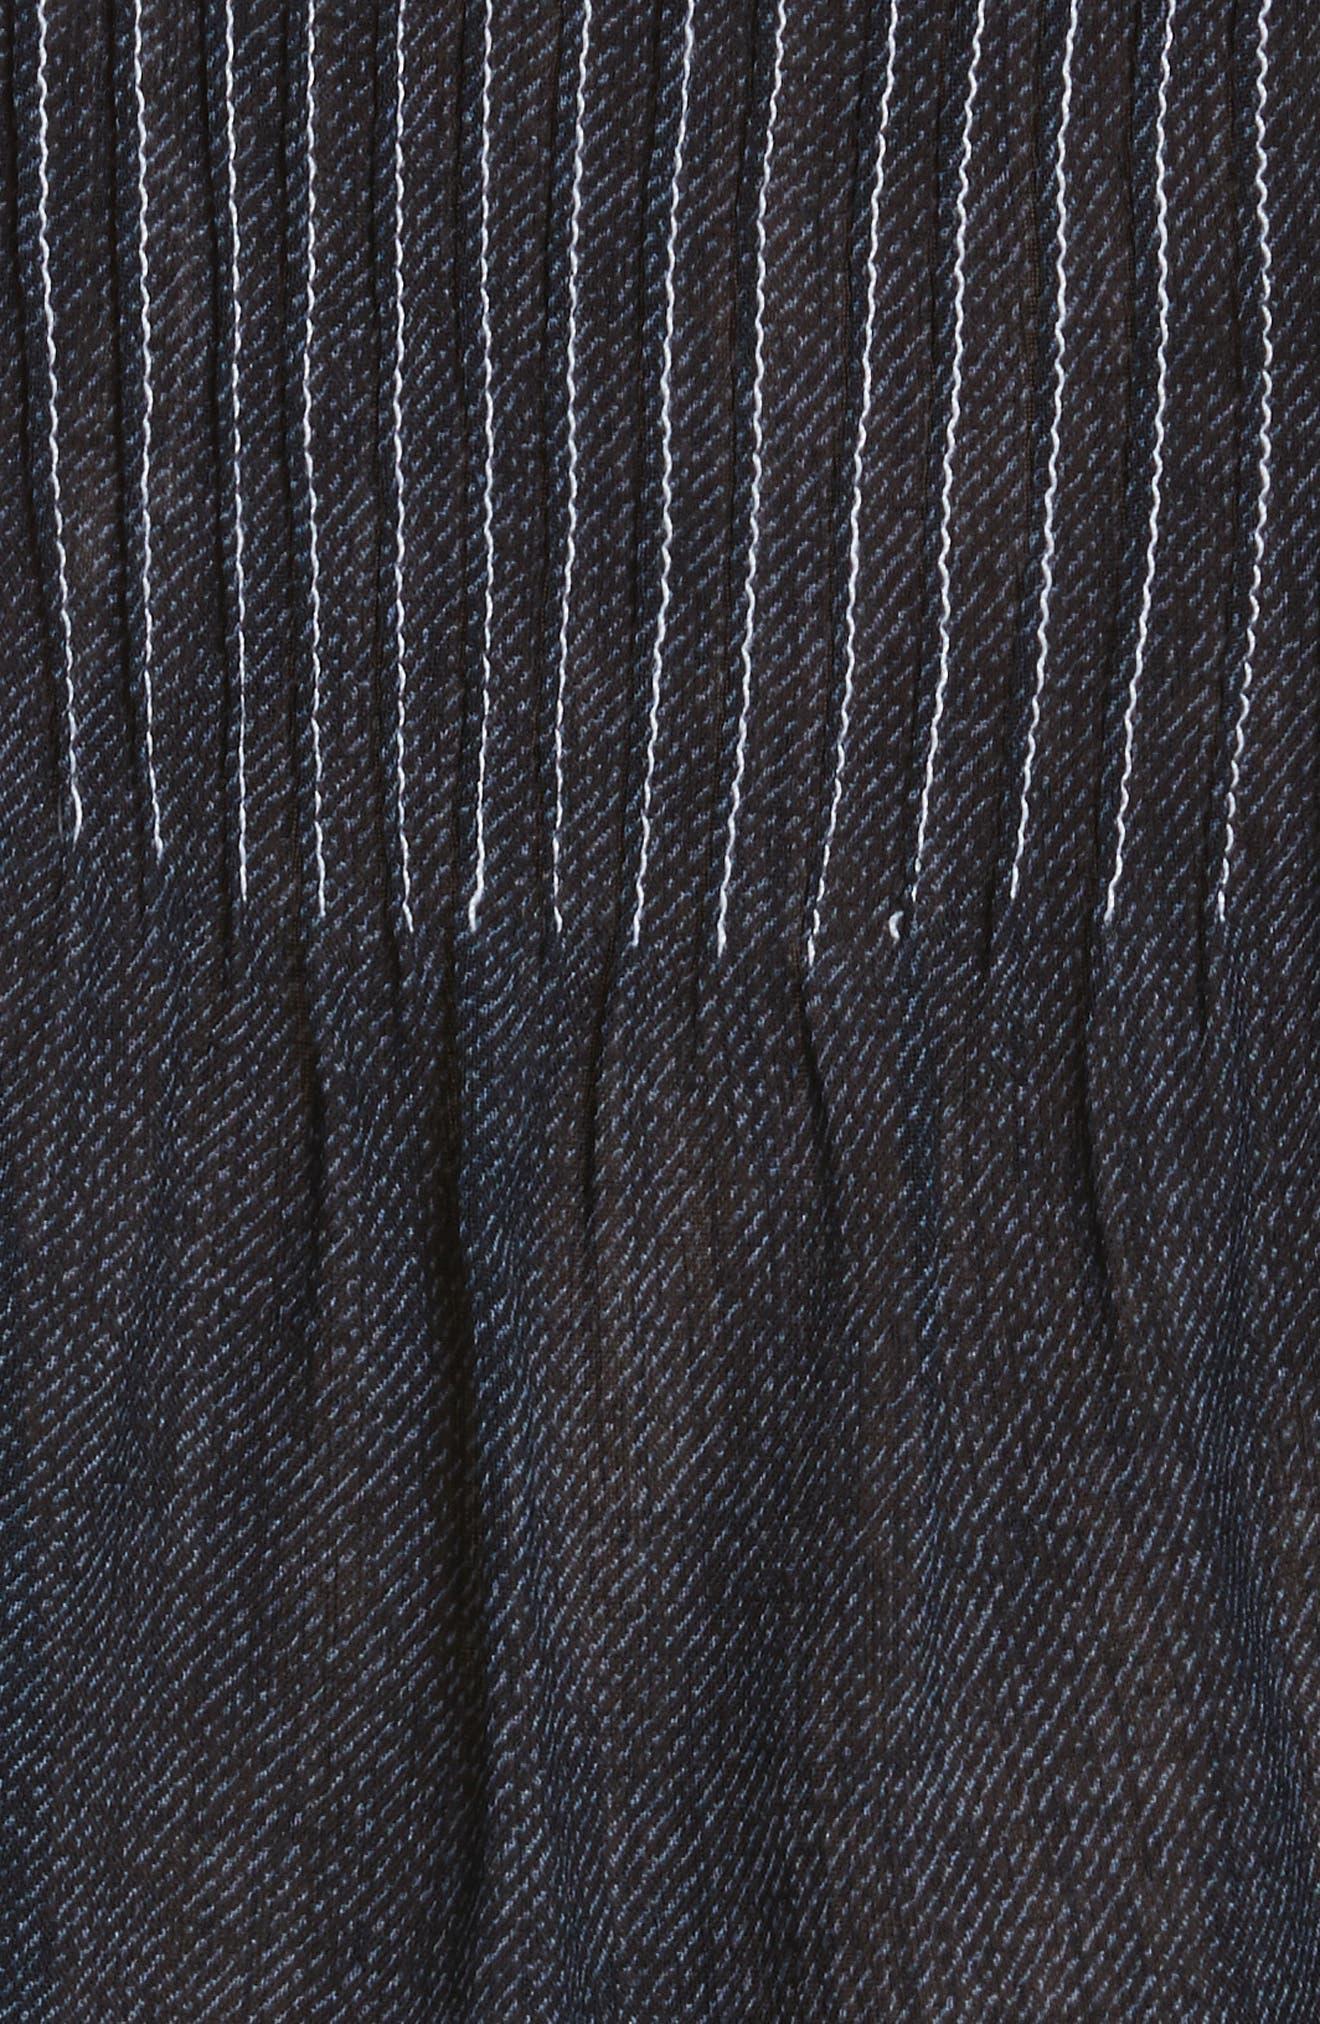 Diane von Furstenberg Pintuck Crop Blouse,                             Alternate thumbnail 5, color,